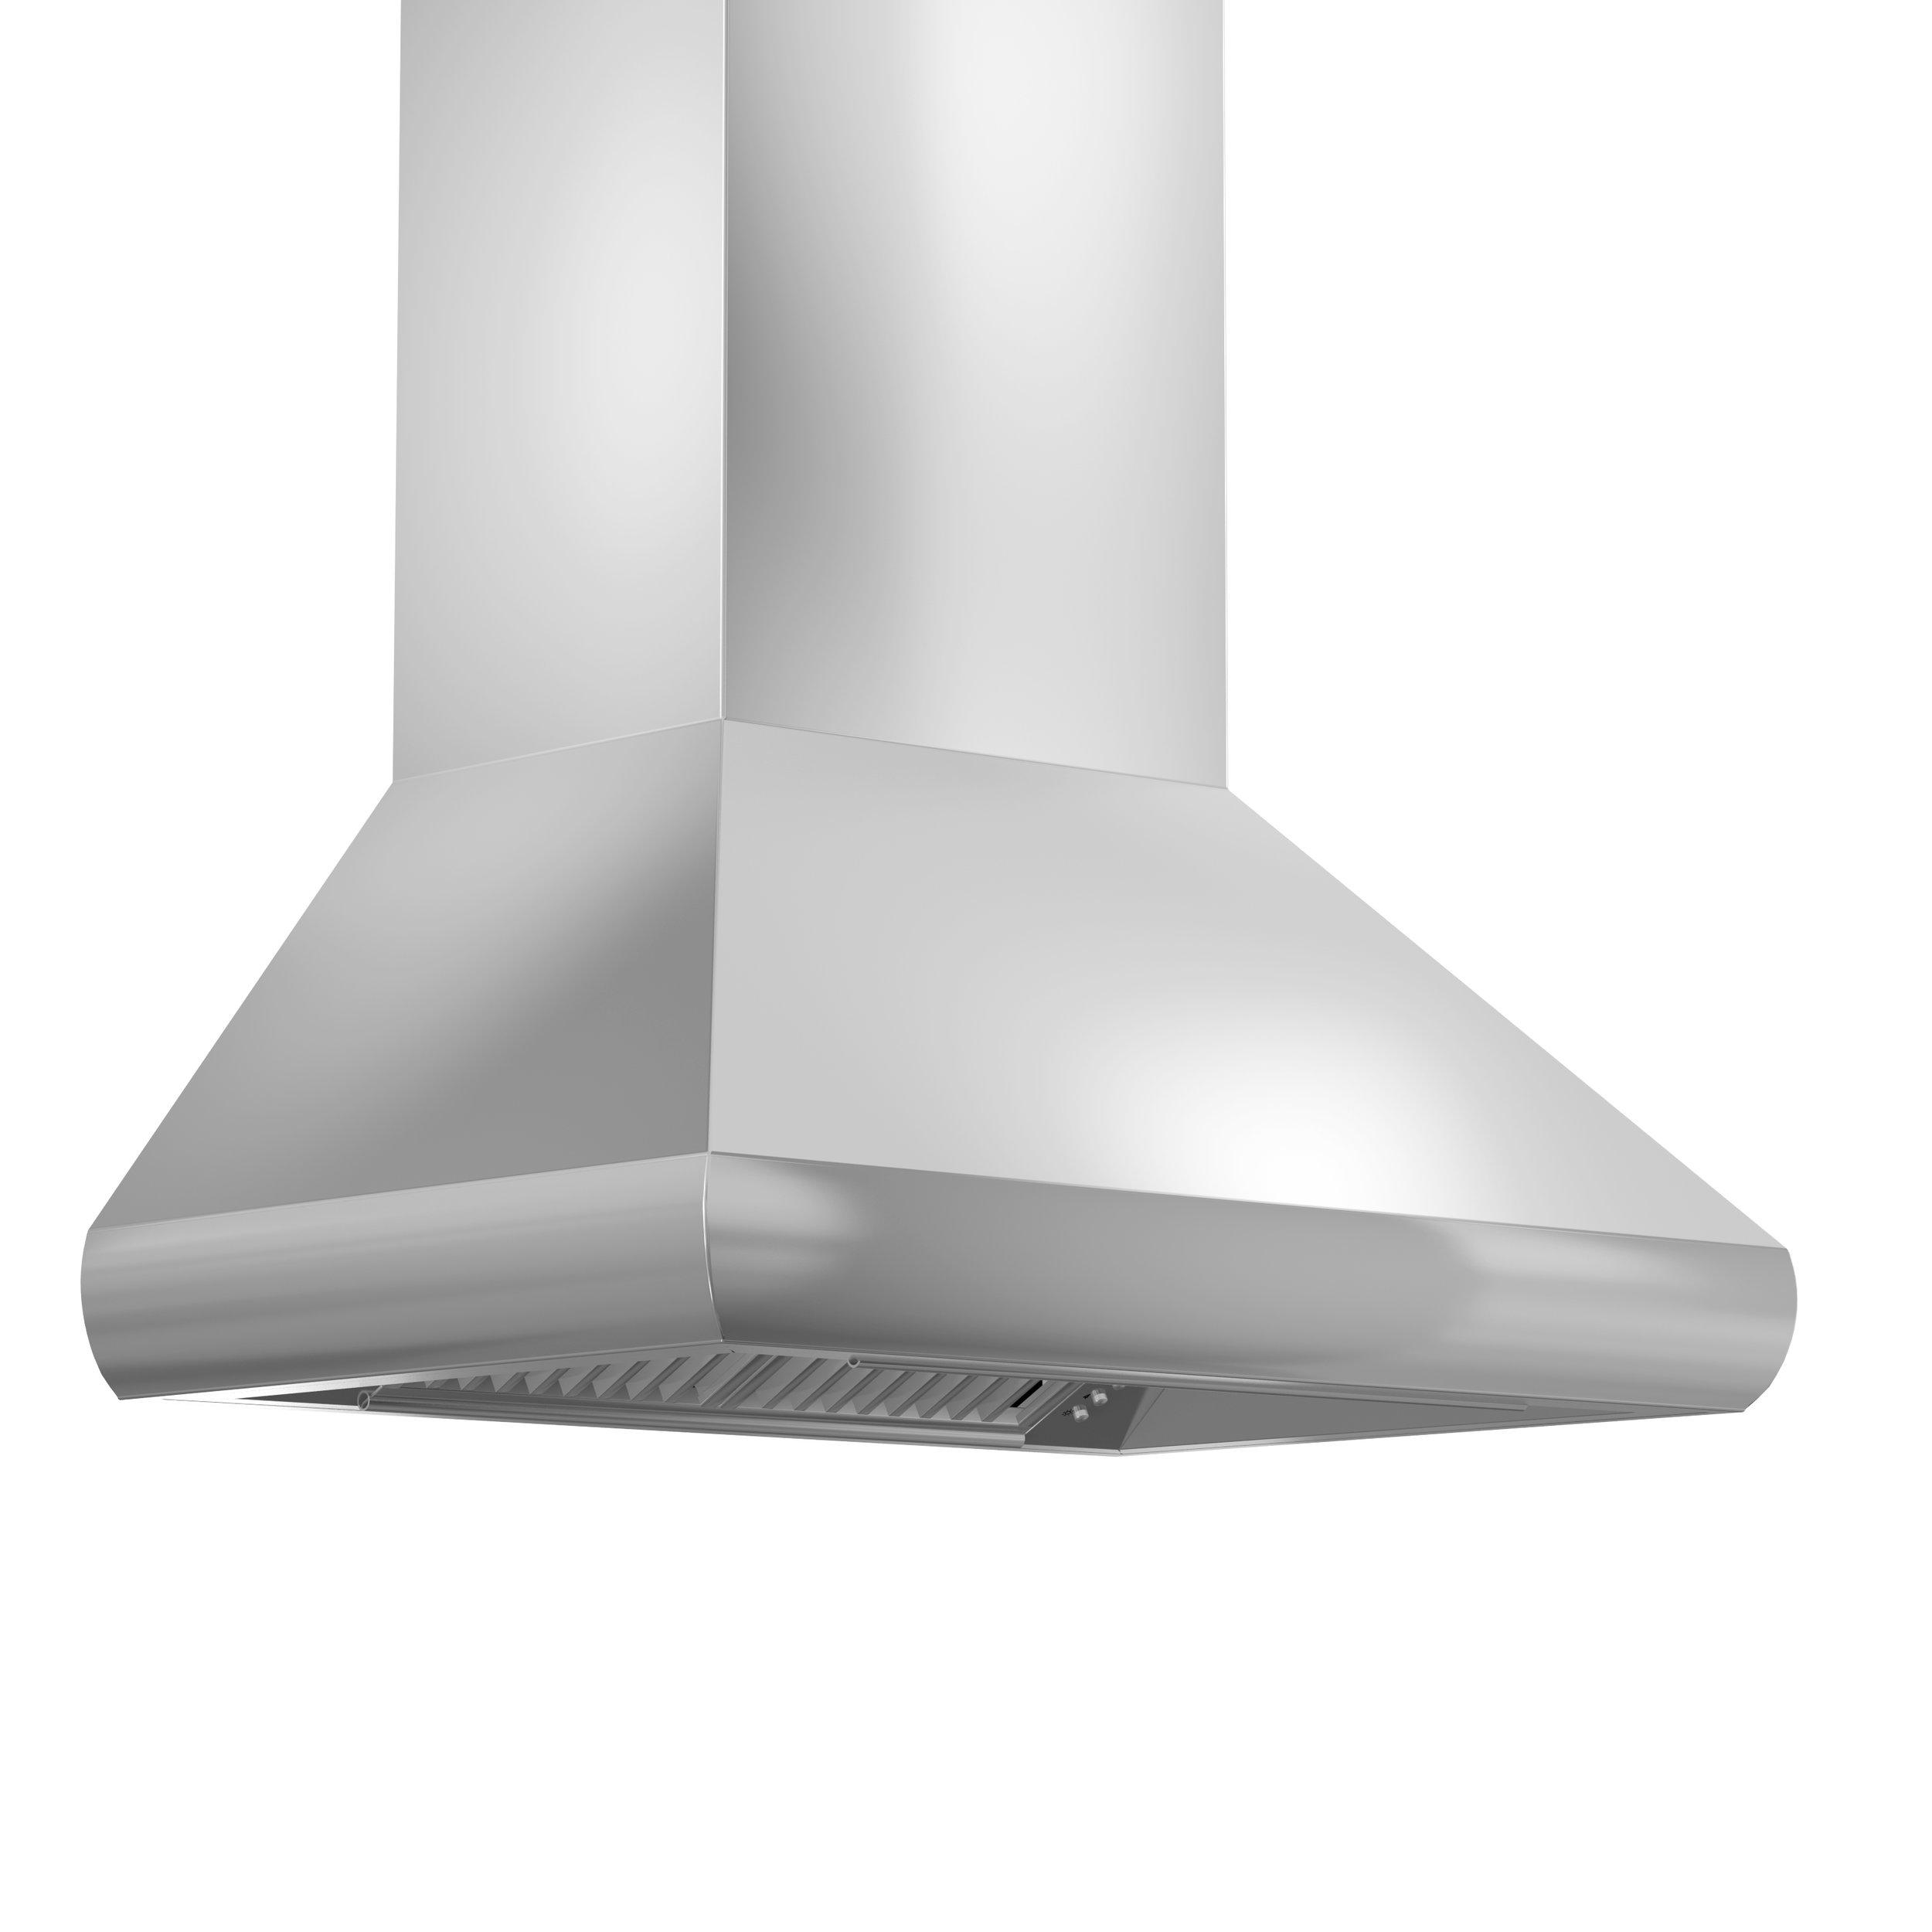 zline-stainless-steel-wall-mounted-range-hood-687-main.jpg